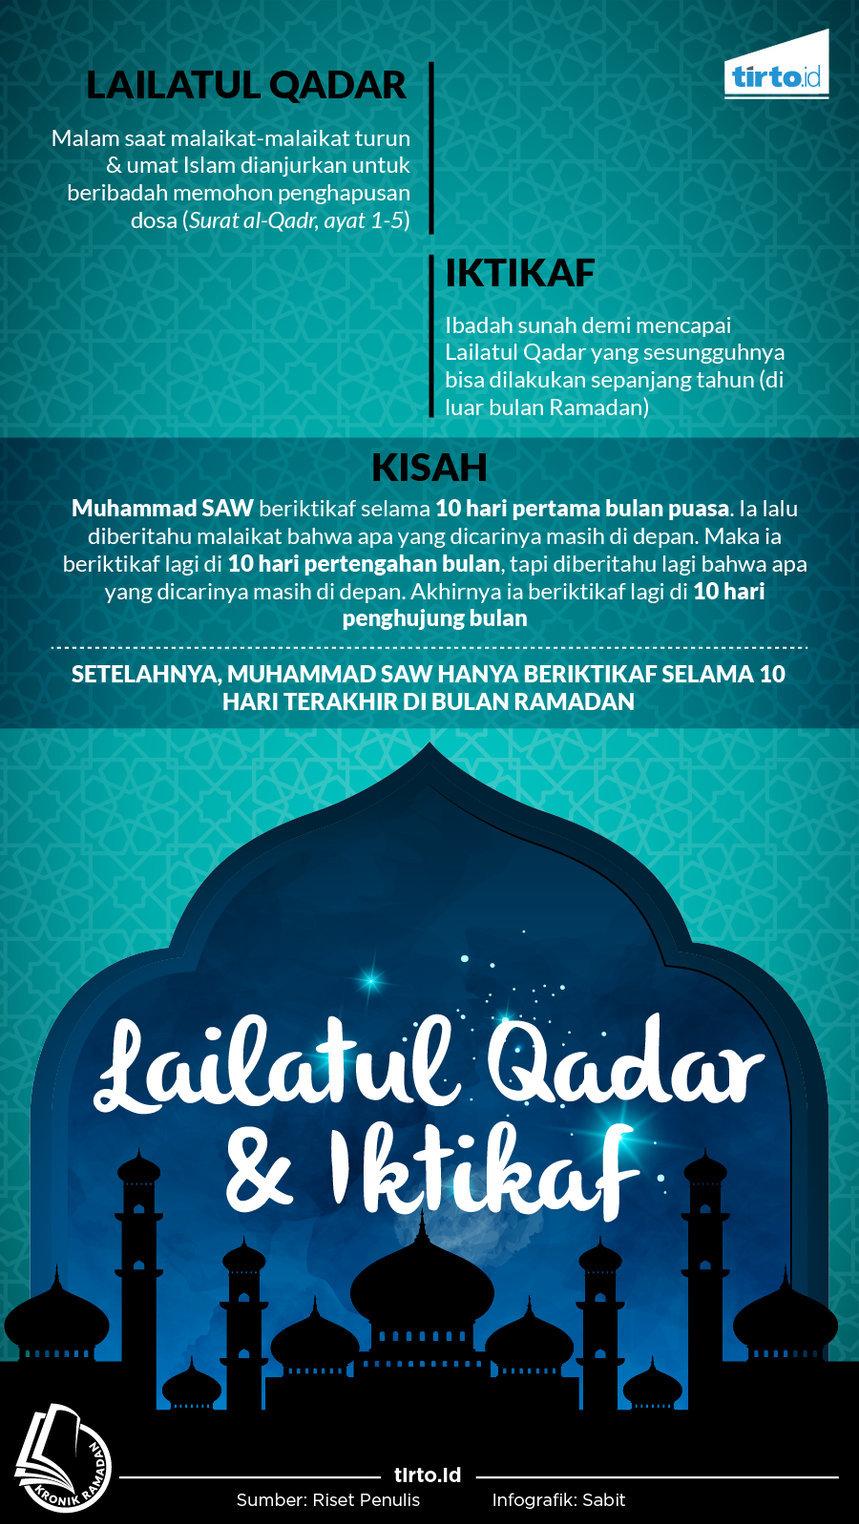 Lailatul Qadar Iktikaf Dan Turunnya Para Malaikat Tirtoid